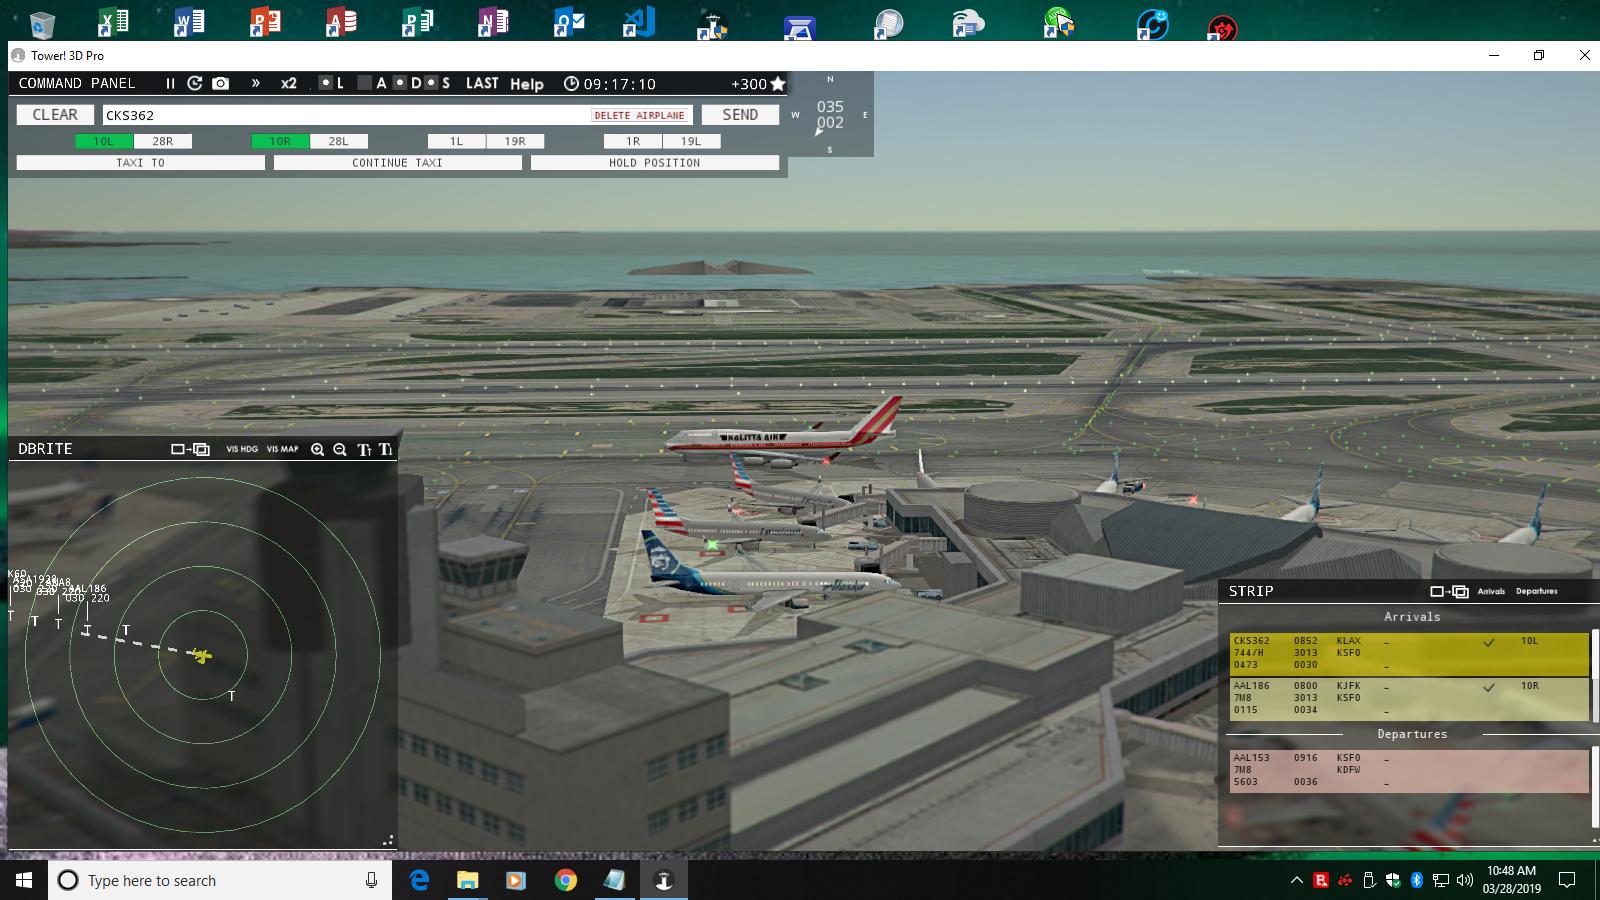 screen shots of tower!3D Pro